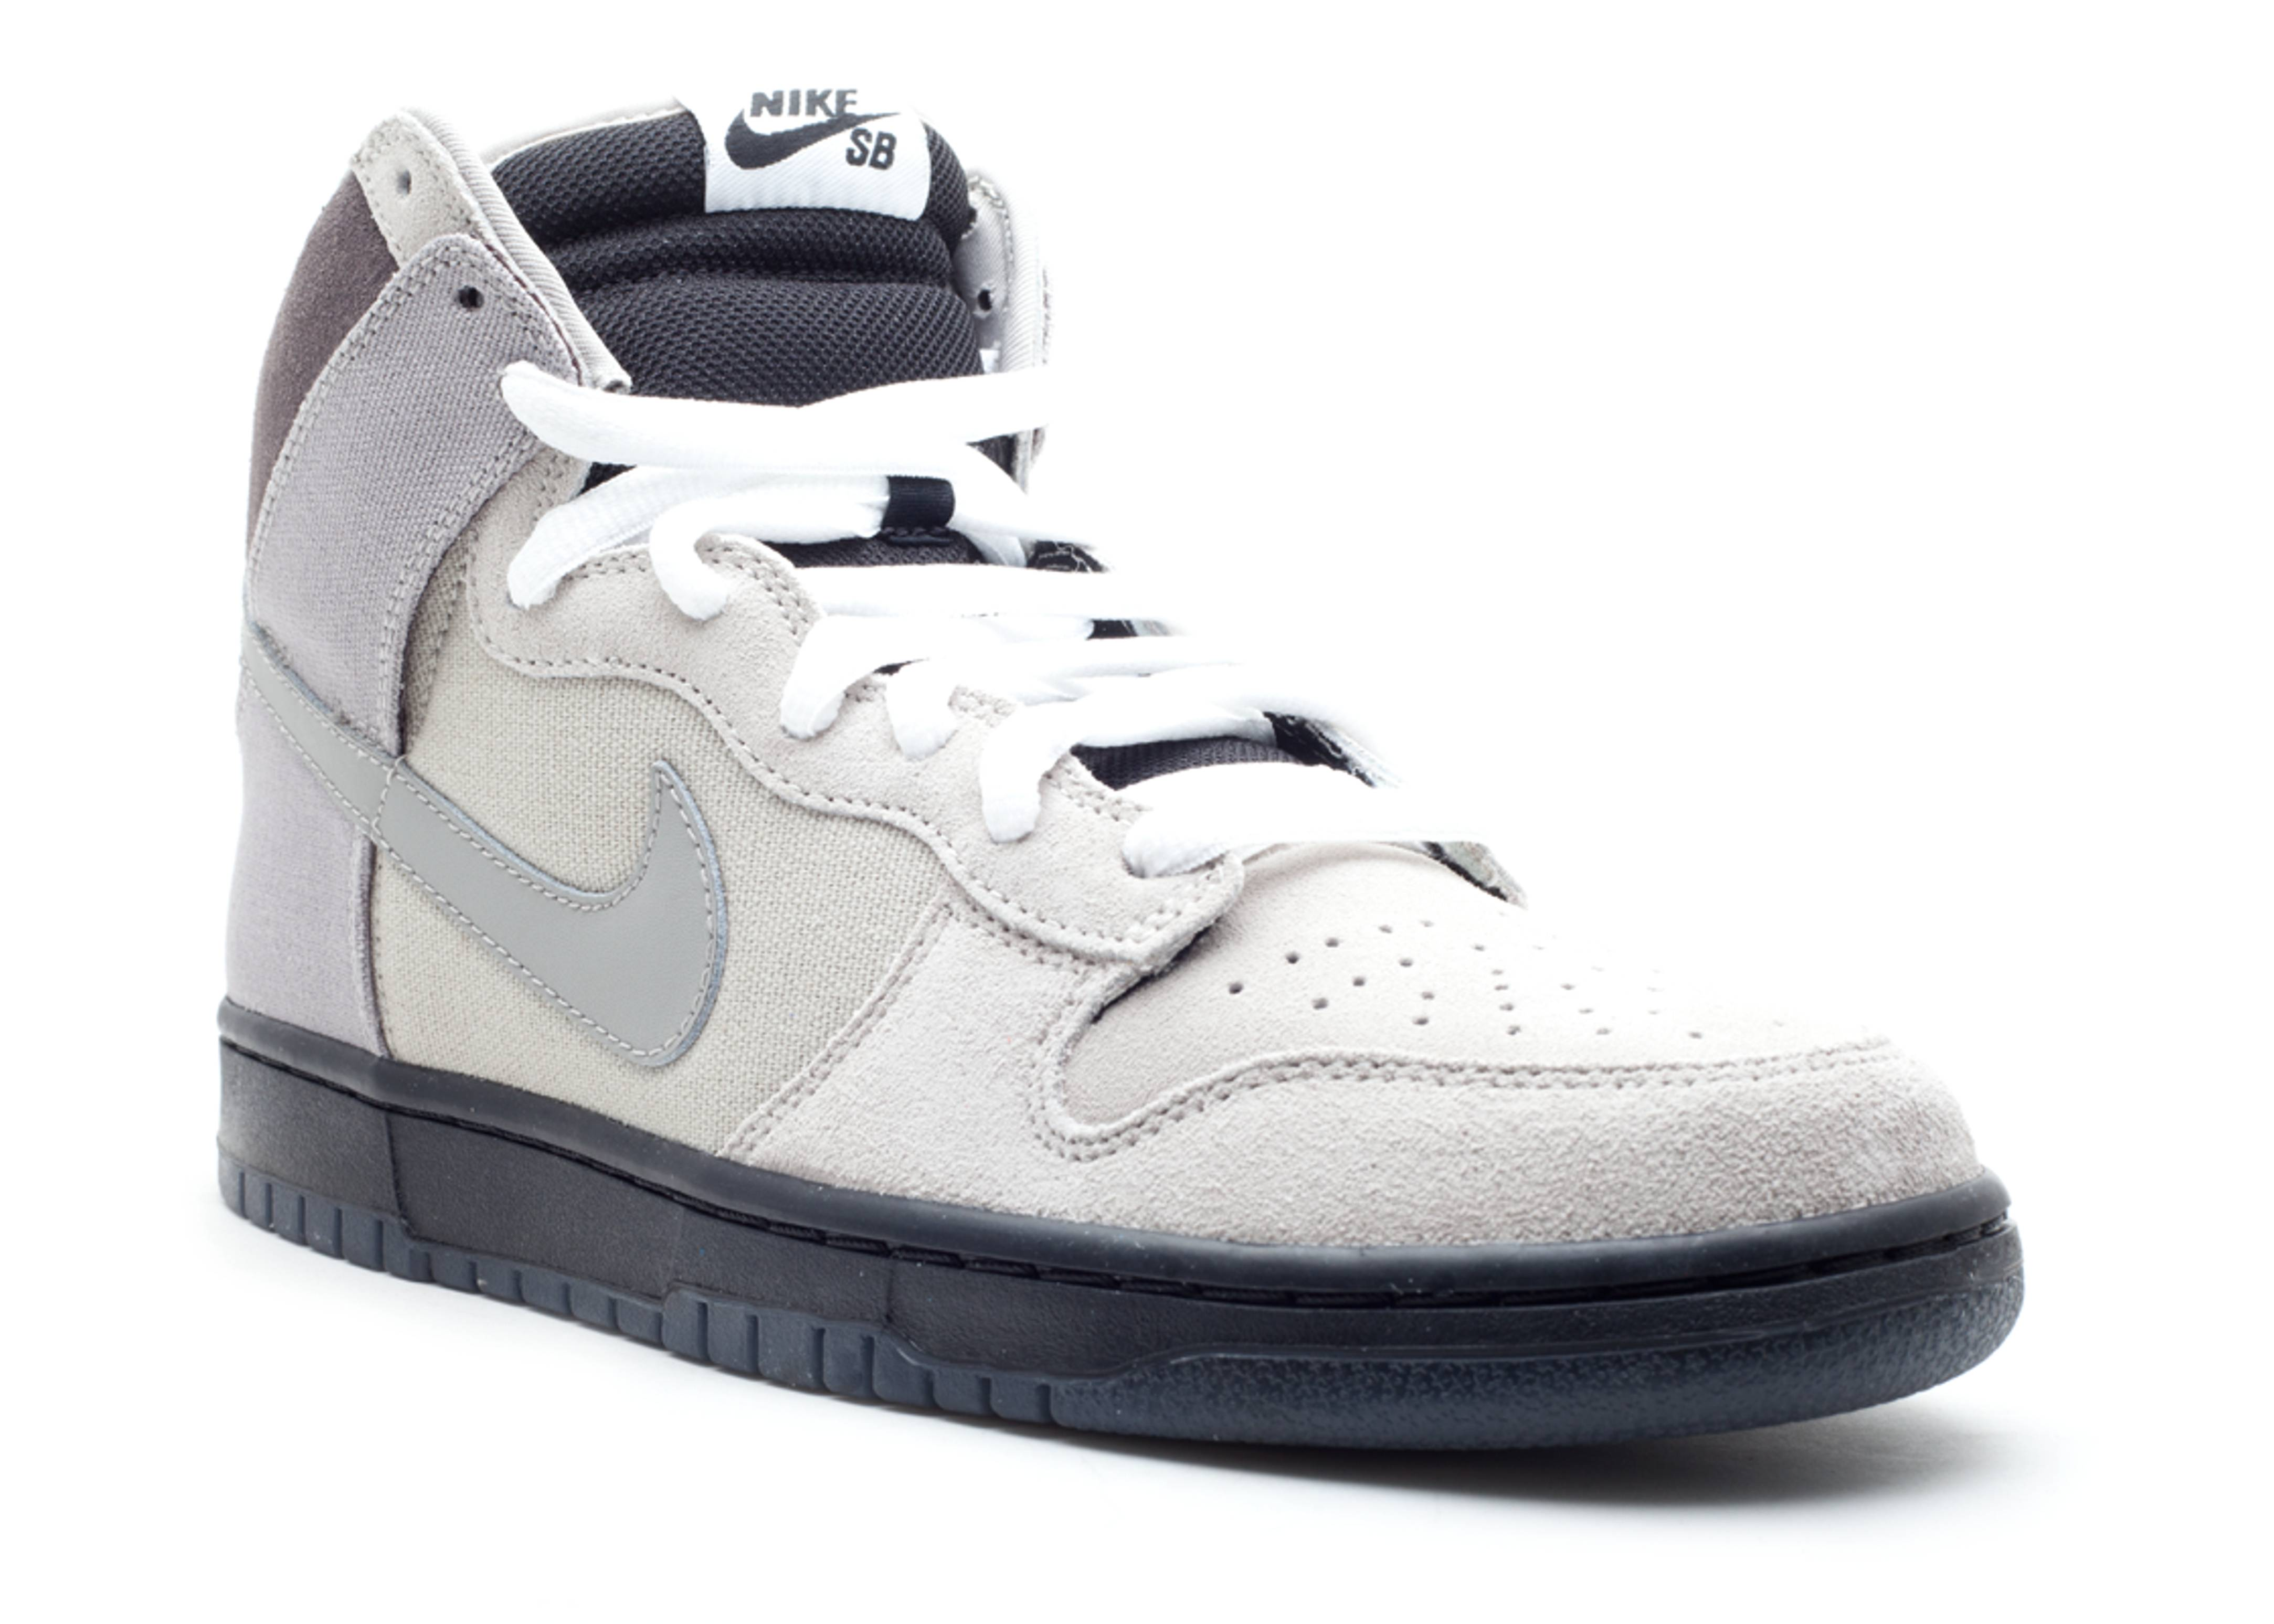 e4e413ae6189 ... Dunk High Pro Sb - Nike - 305050 006 - magnet medium grey Flight Club  clearance